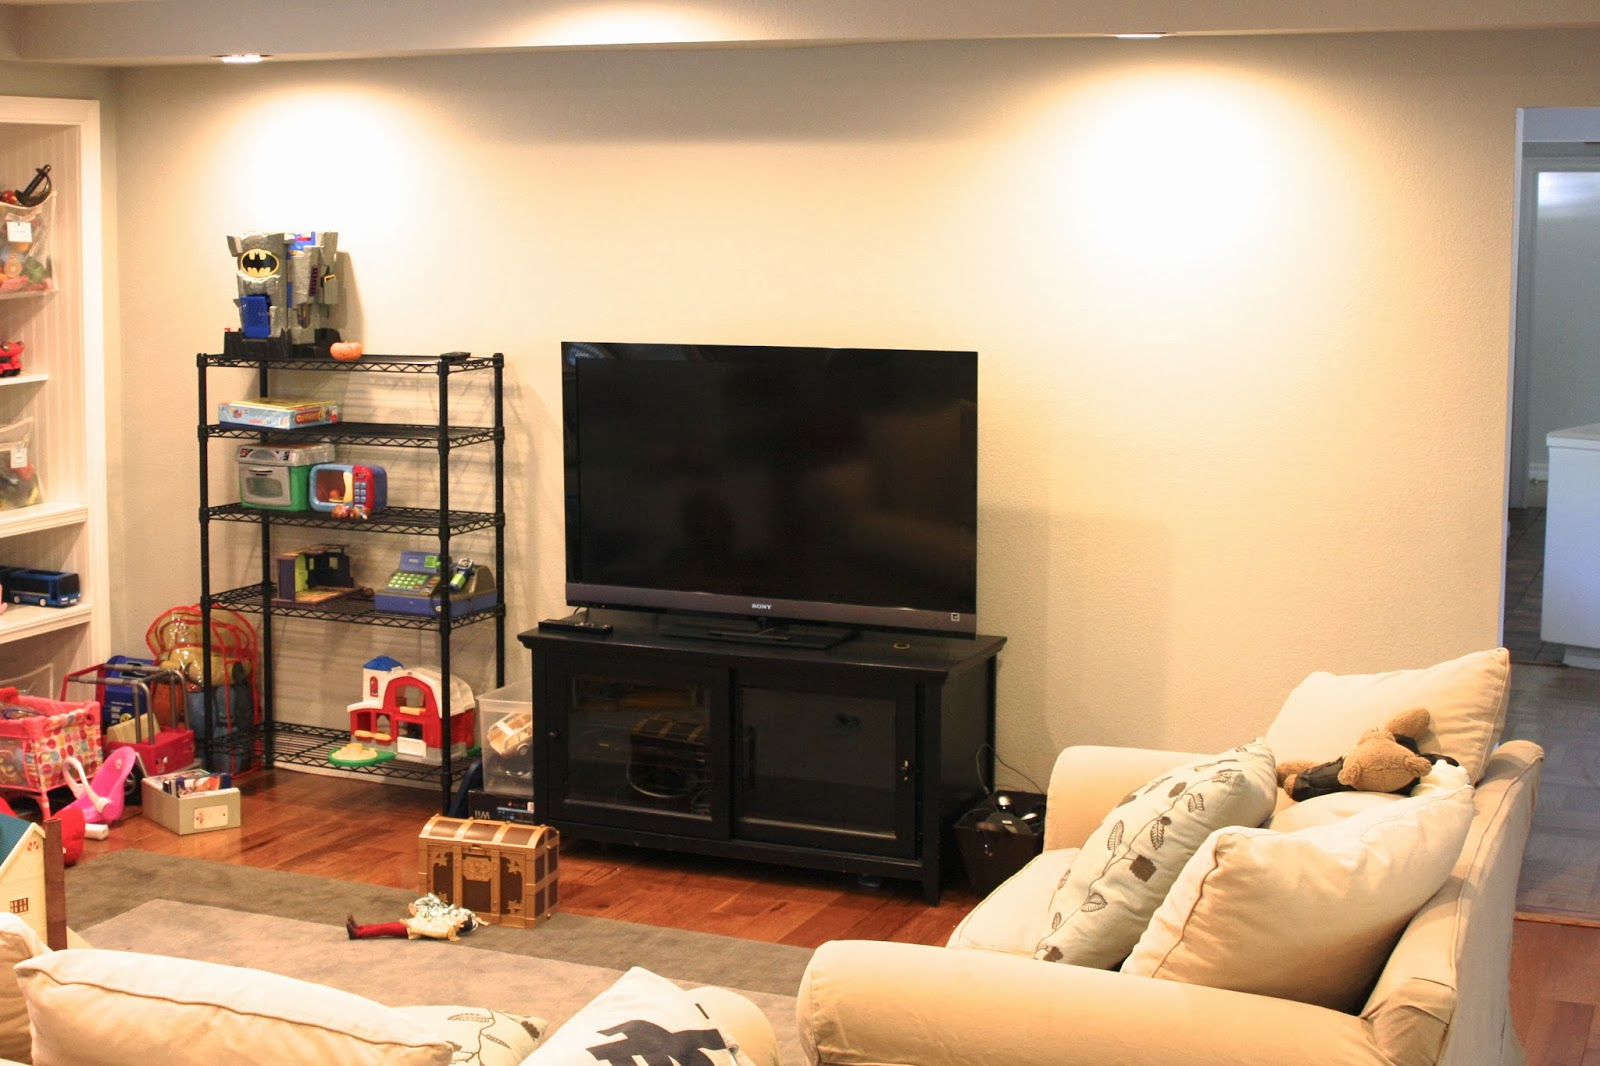 Home Improvement: organized playroom - california style